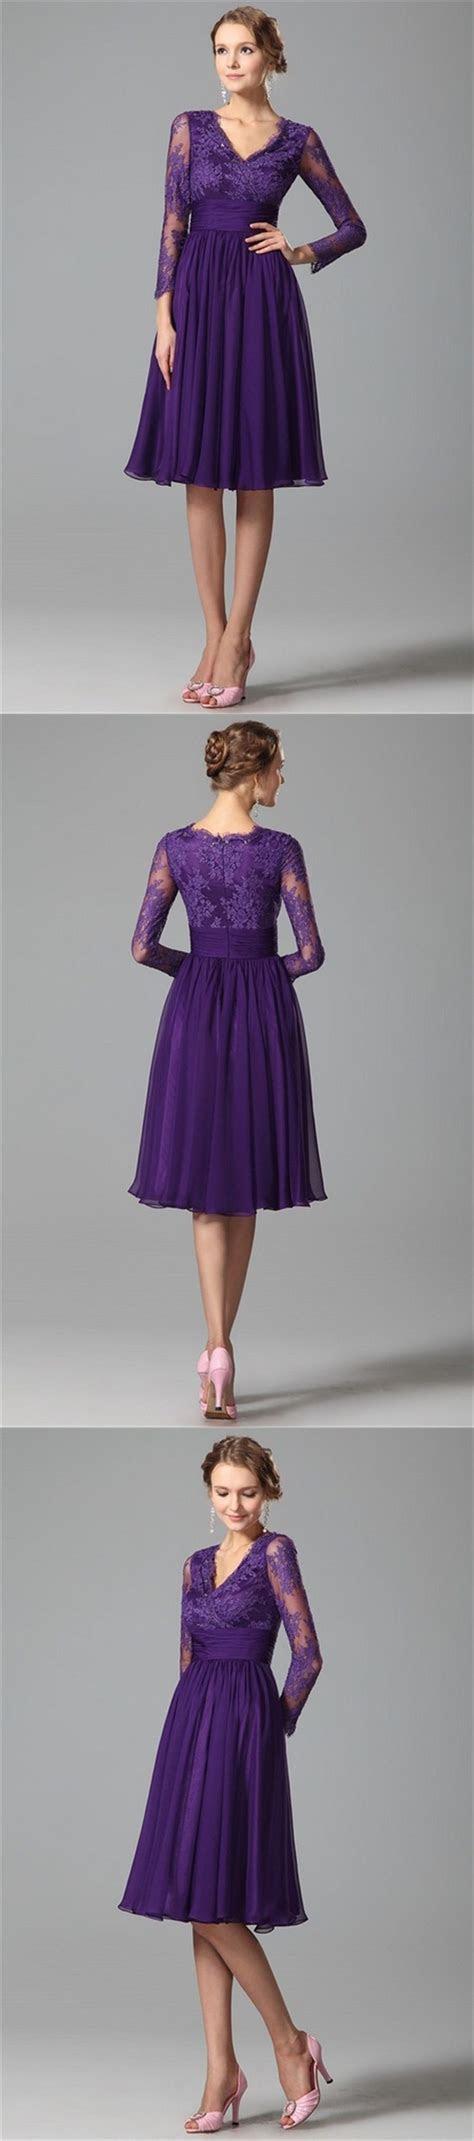 Purple Bridesmaid Dresses 2016 Lace 3/4 Long Sleeves V